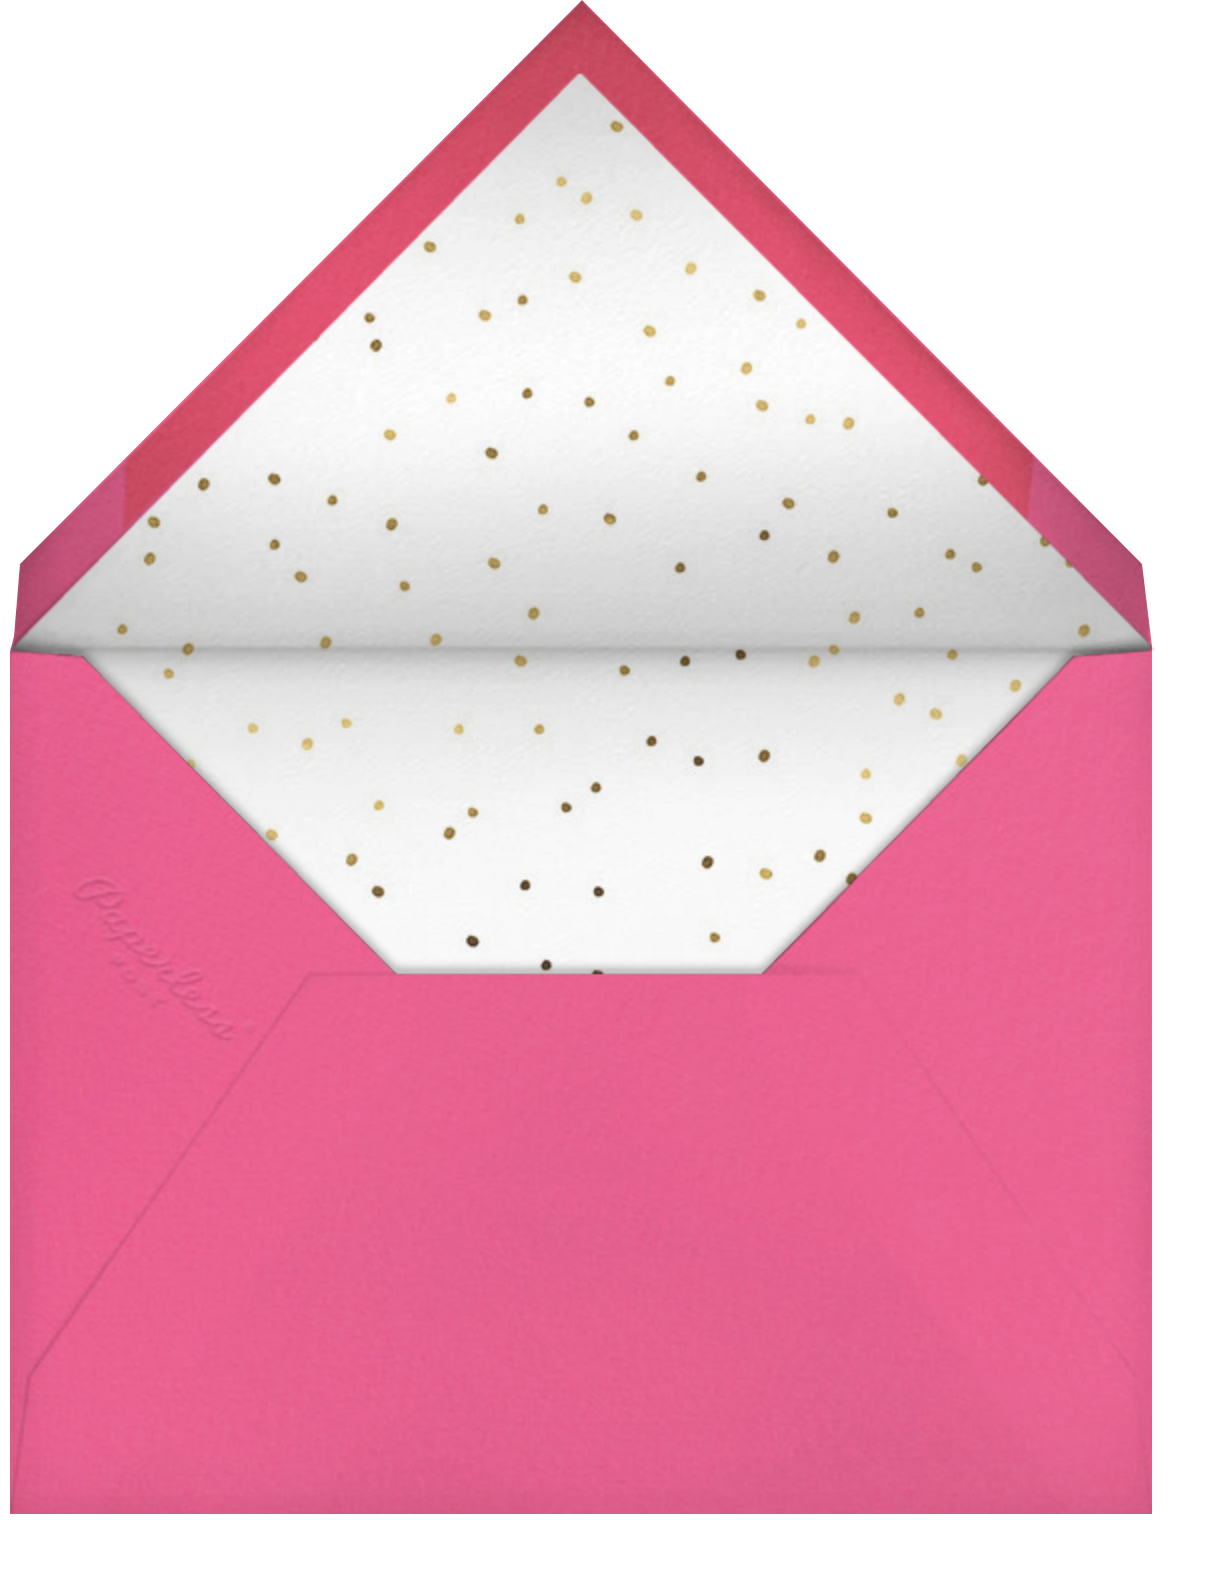 Flamingle All the Way - Meri Meri - Christmas - envelope back